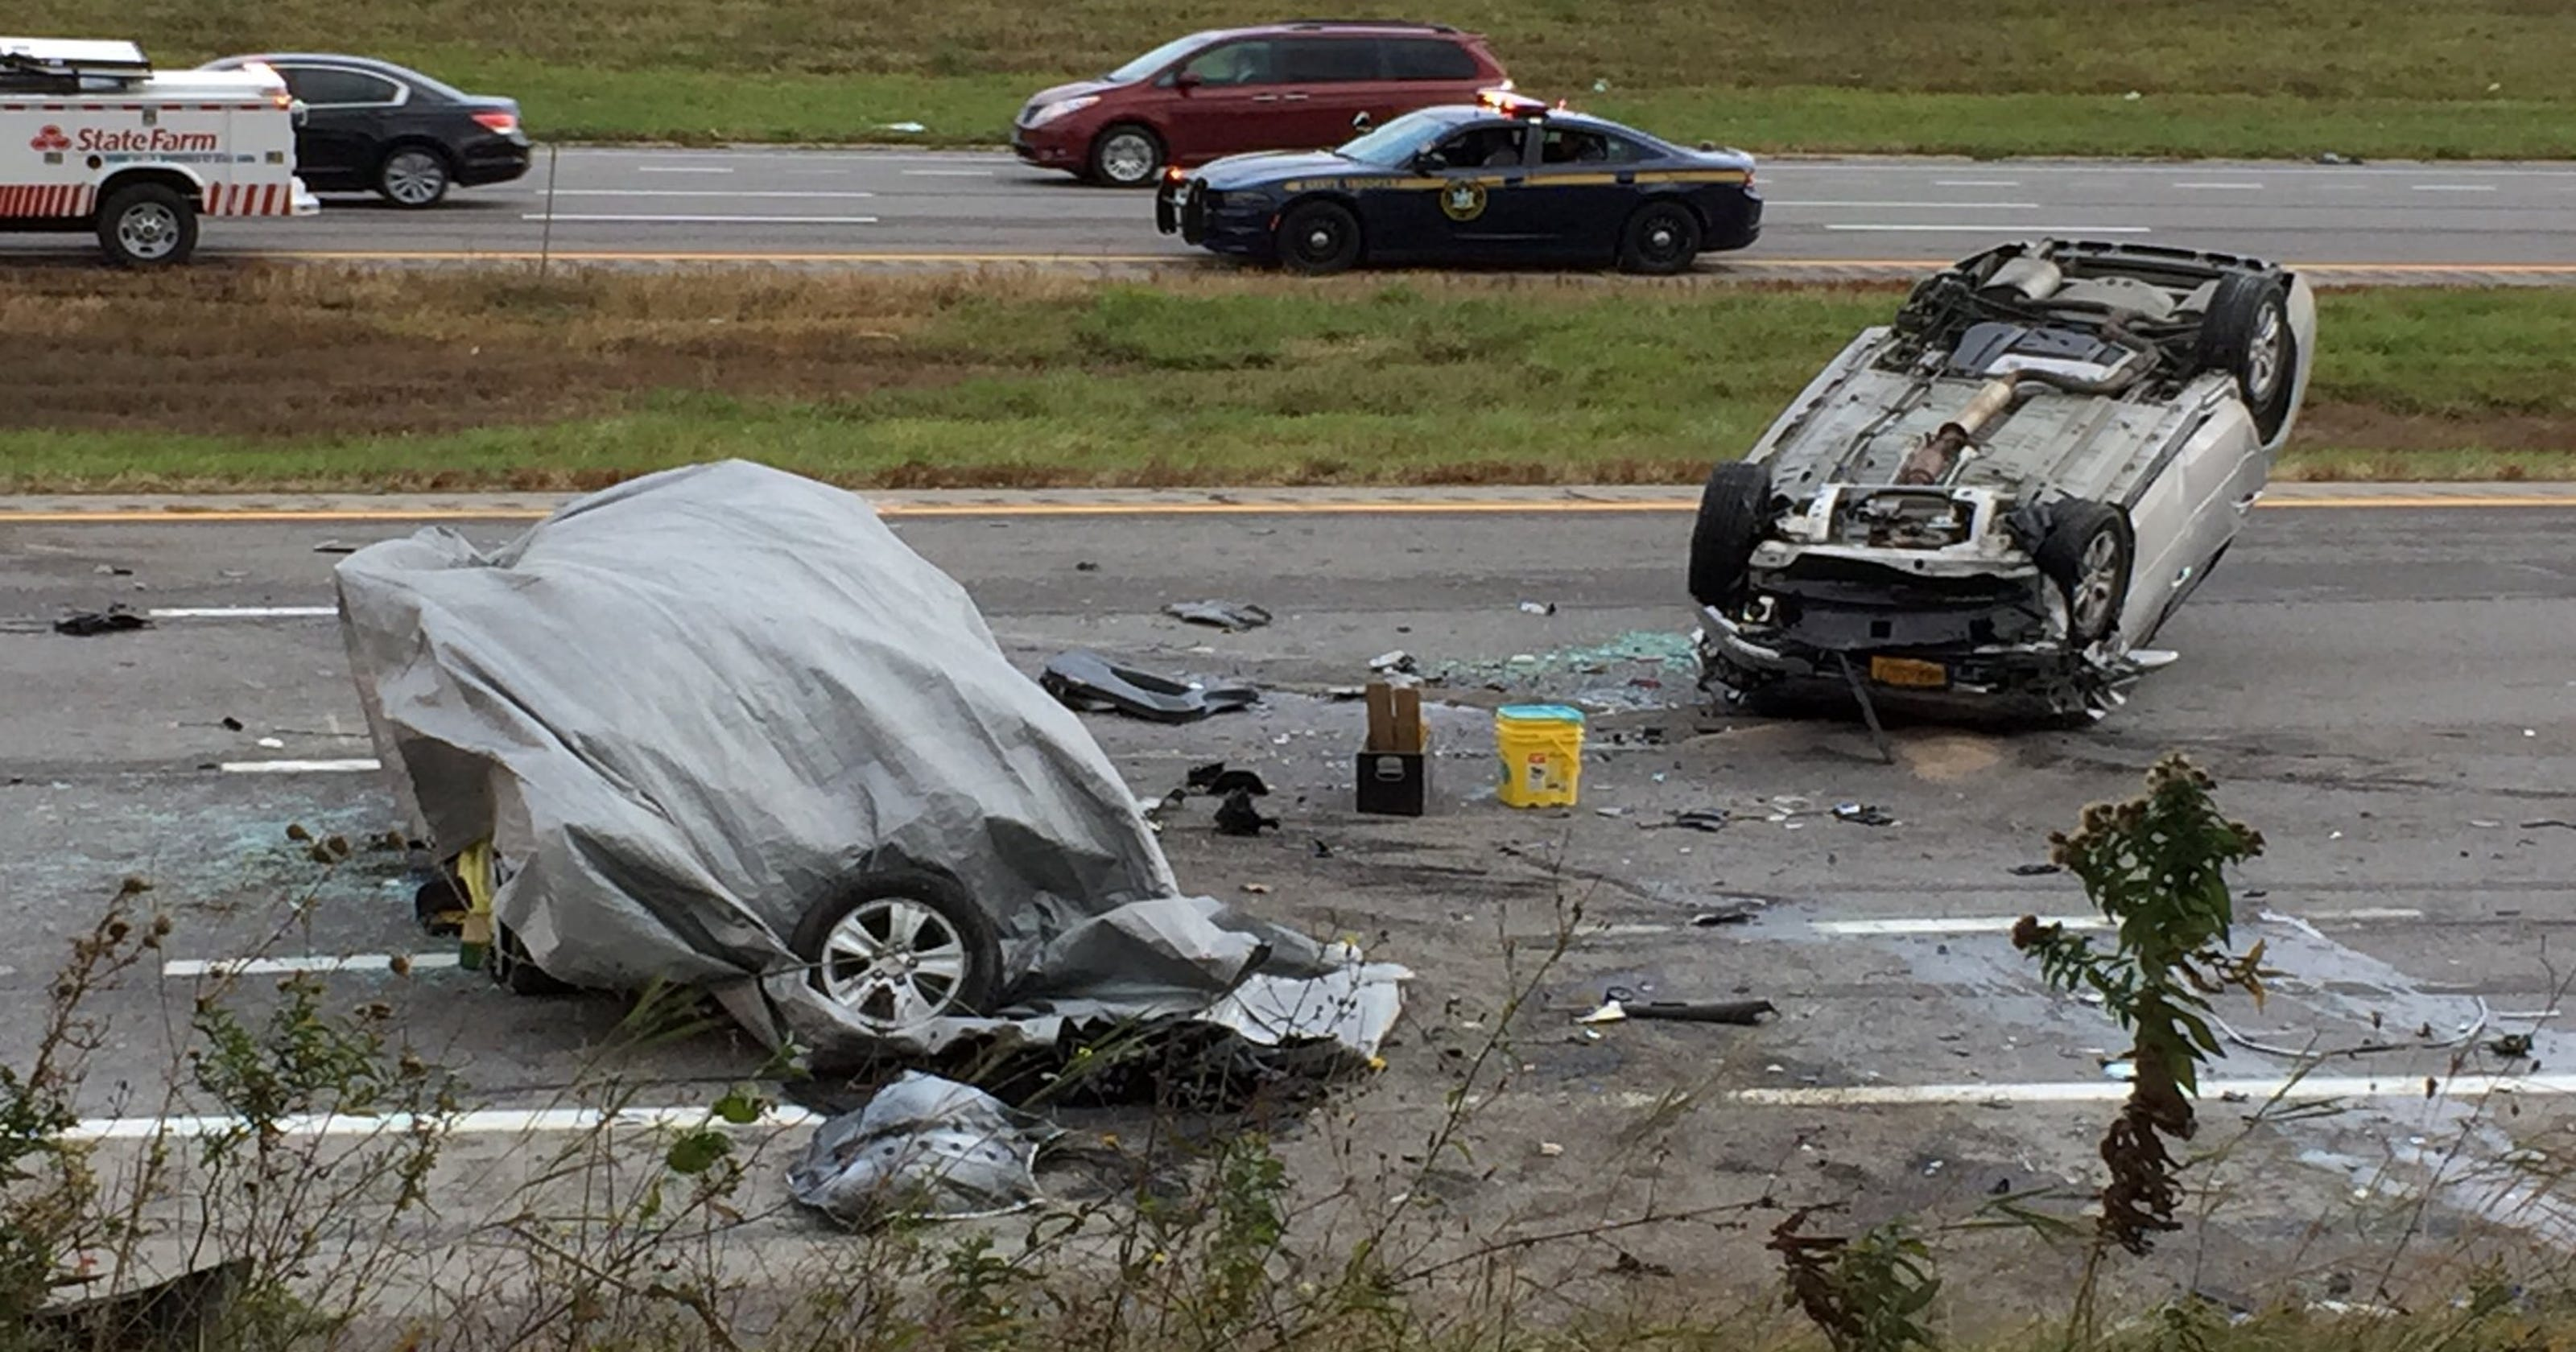 i-390 crash: kristina maye, terry gilbert identified as two killed